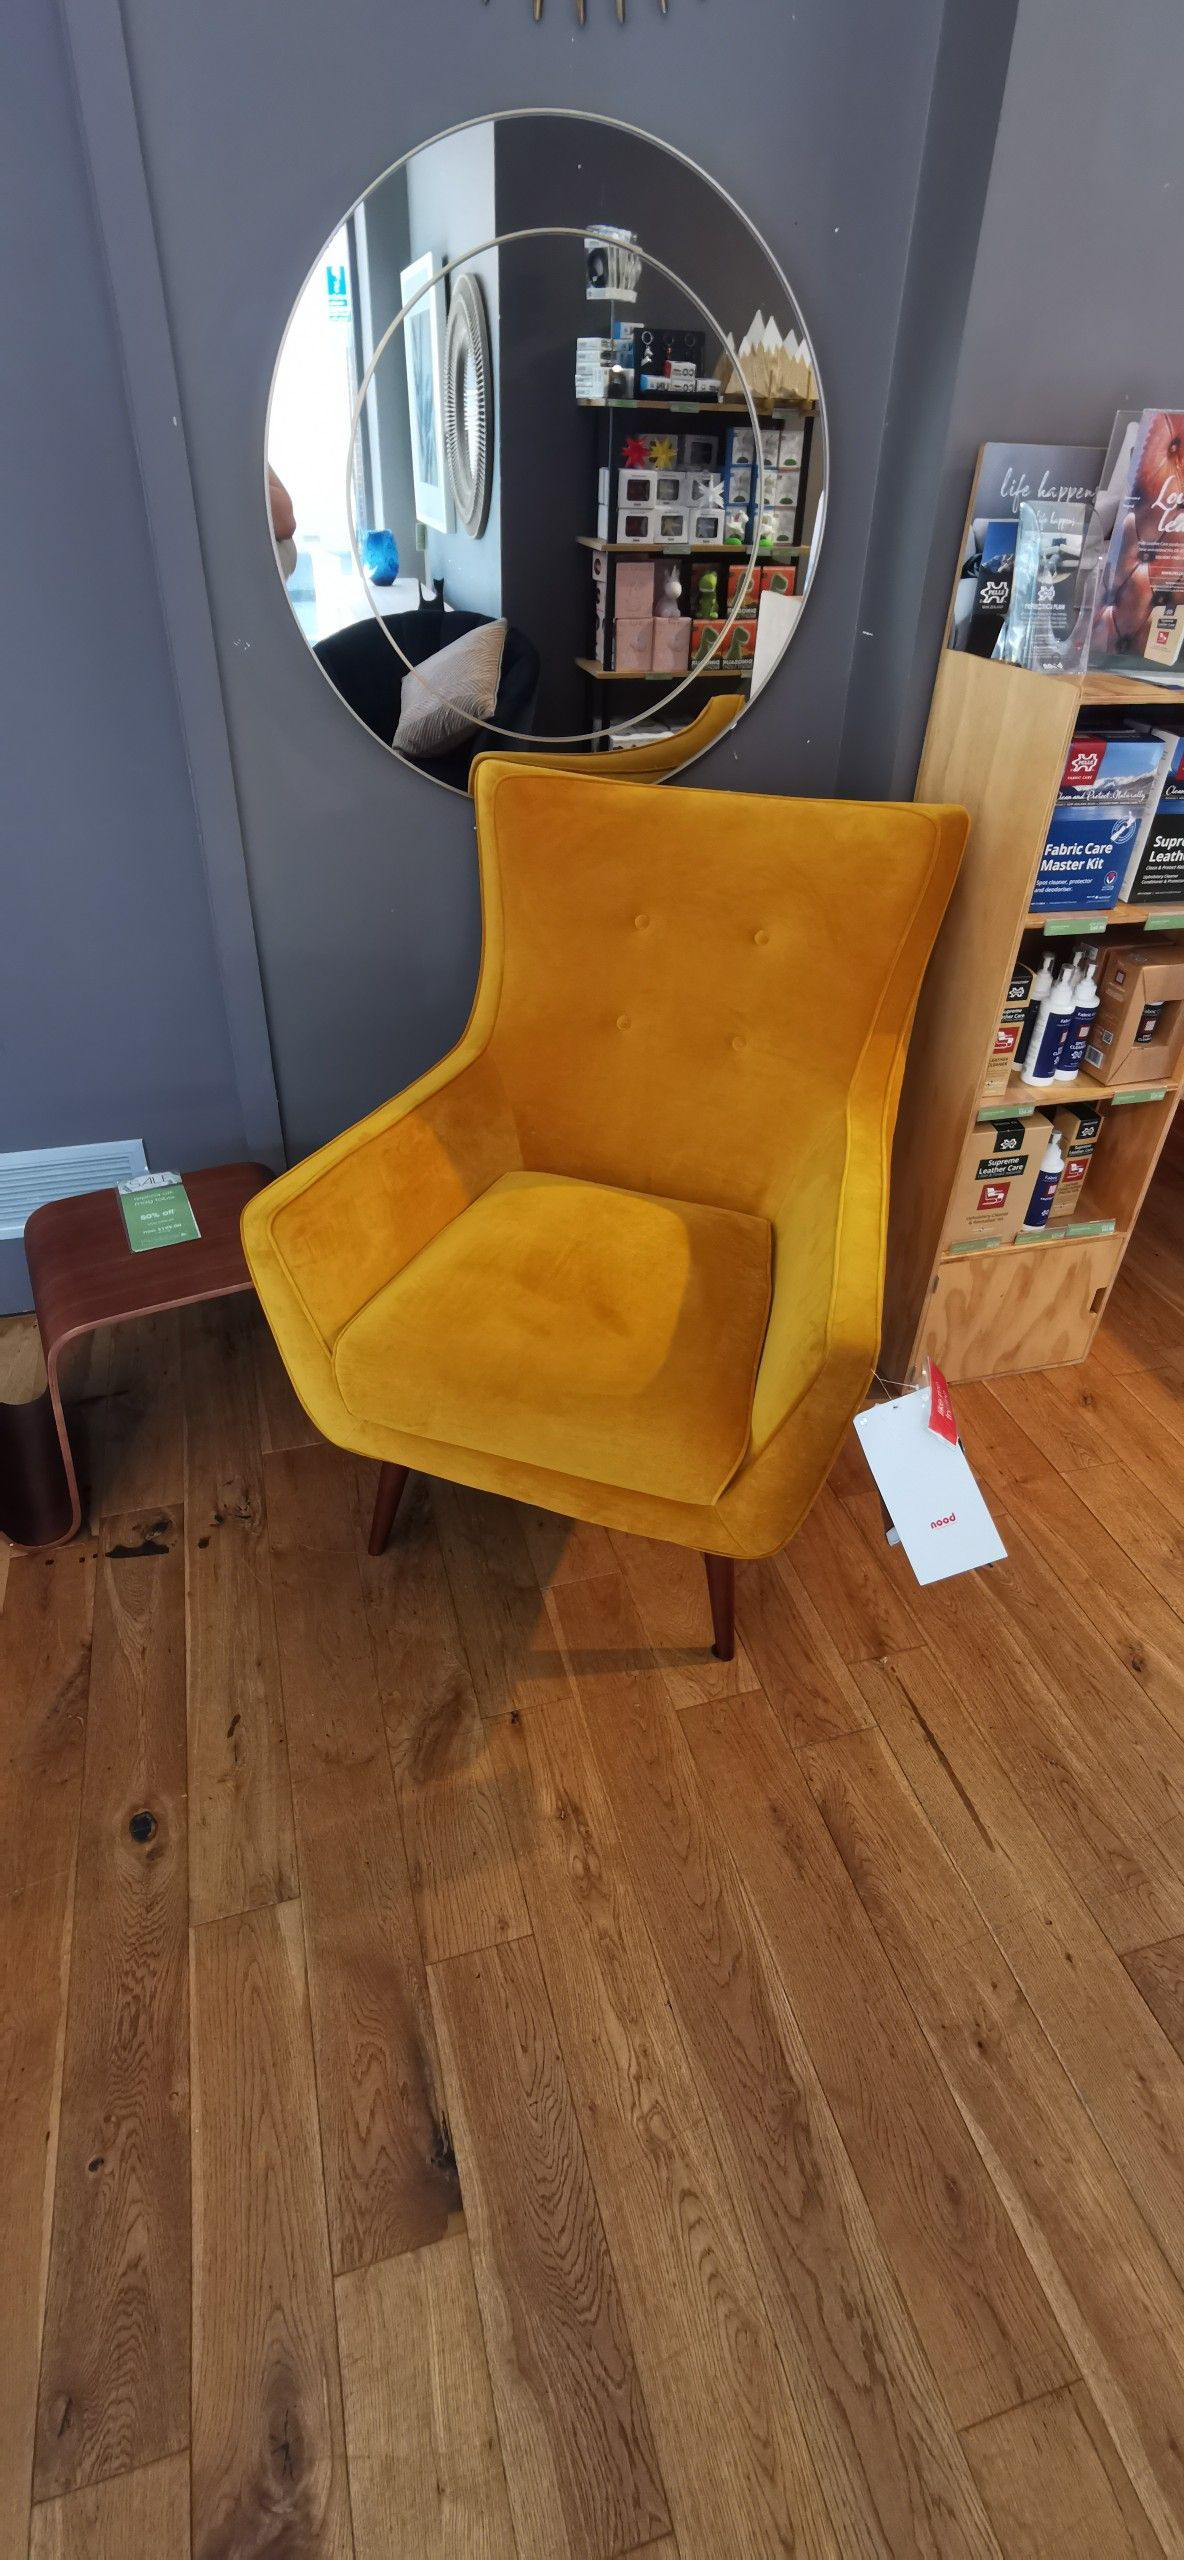 Arista armchair yellow nood yellow armchair armchair